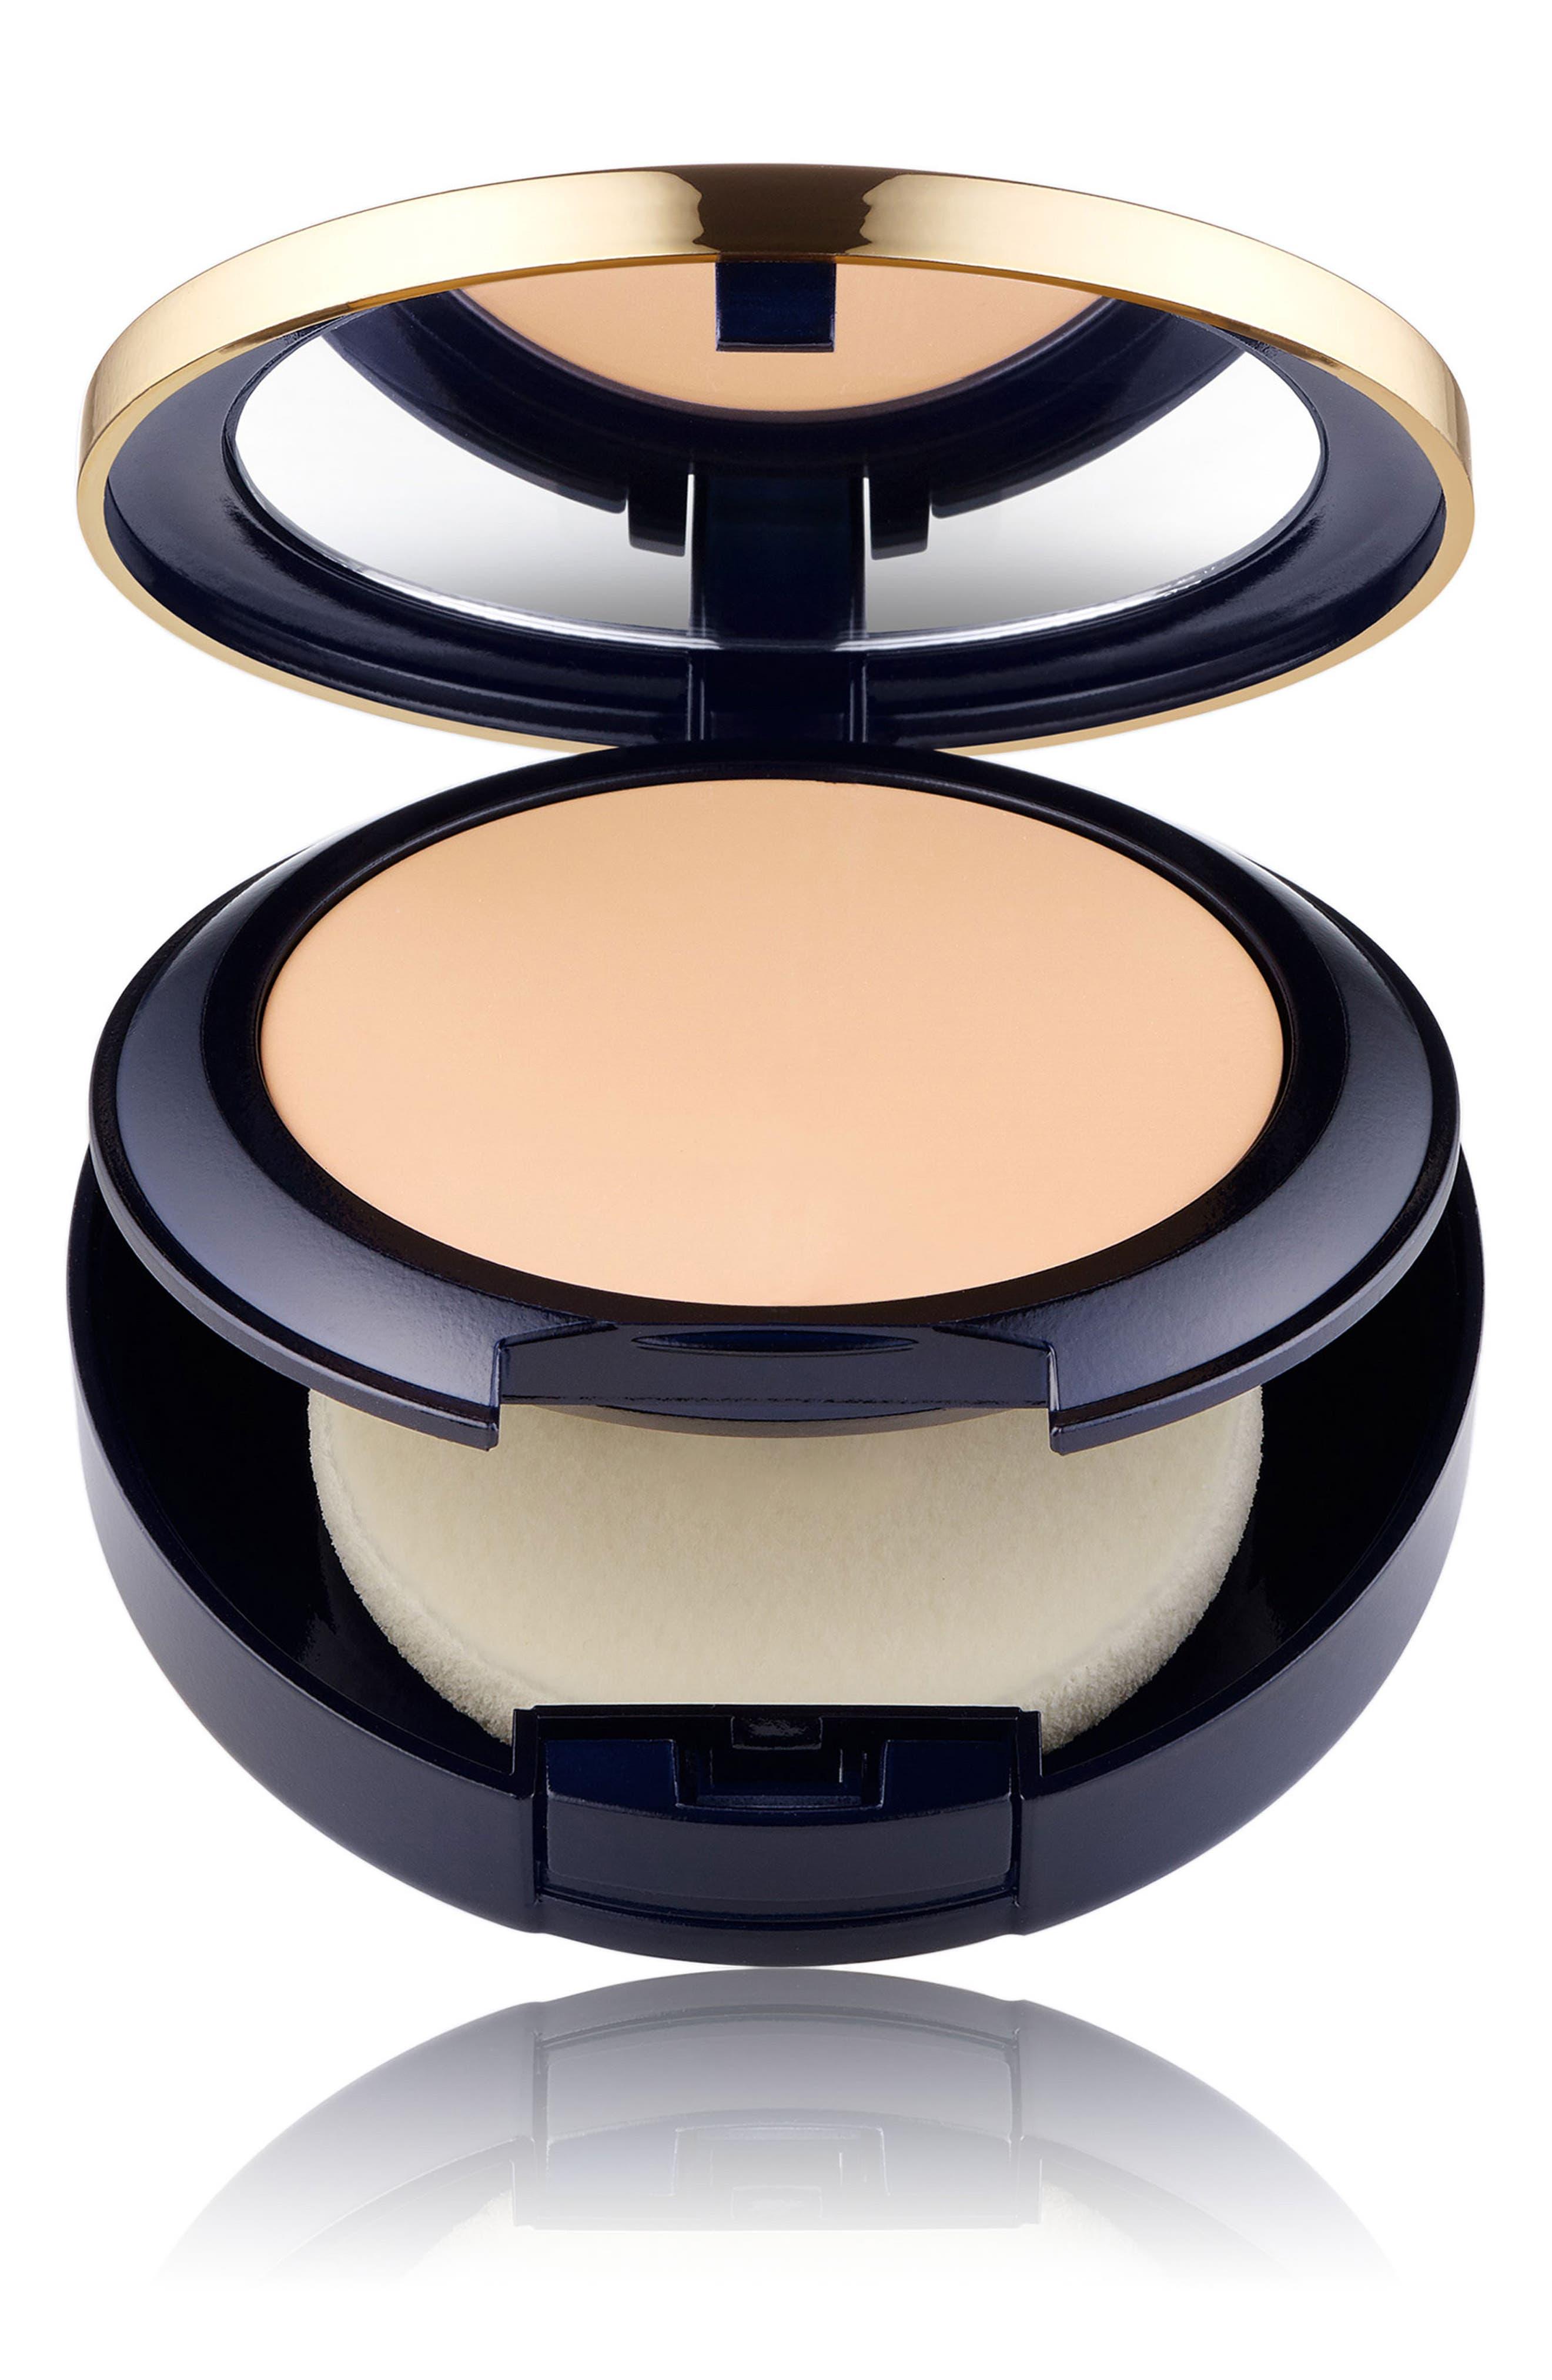 Estee Lauder Double Wear Stay In Place Matte Powder Foundation - 1C0 Shell